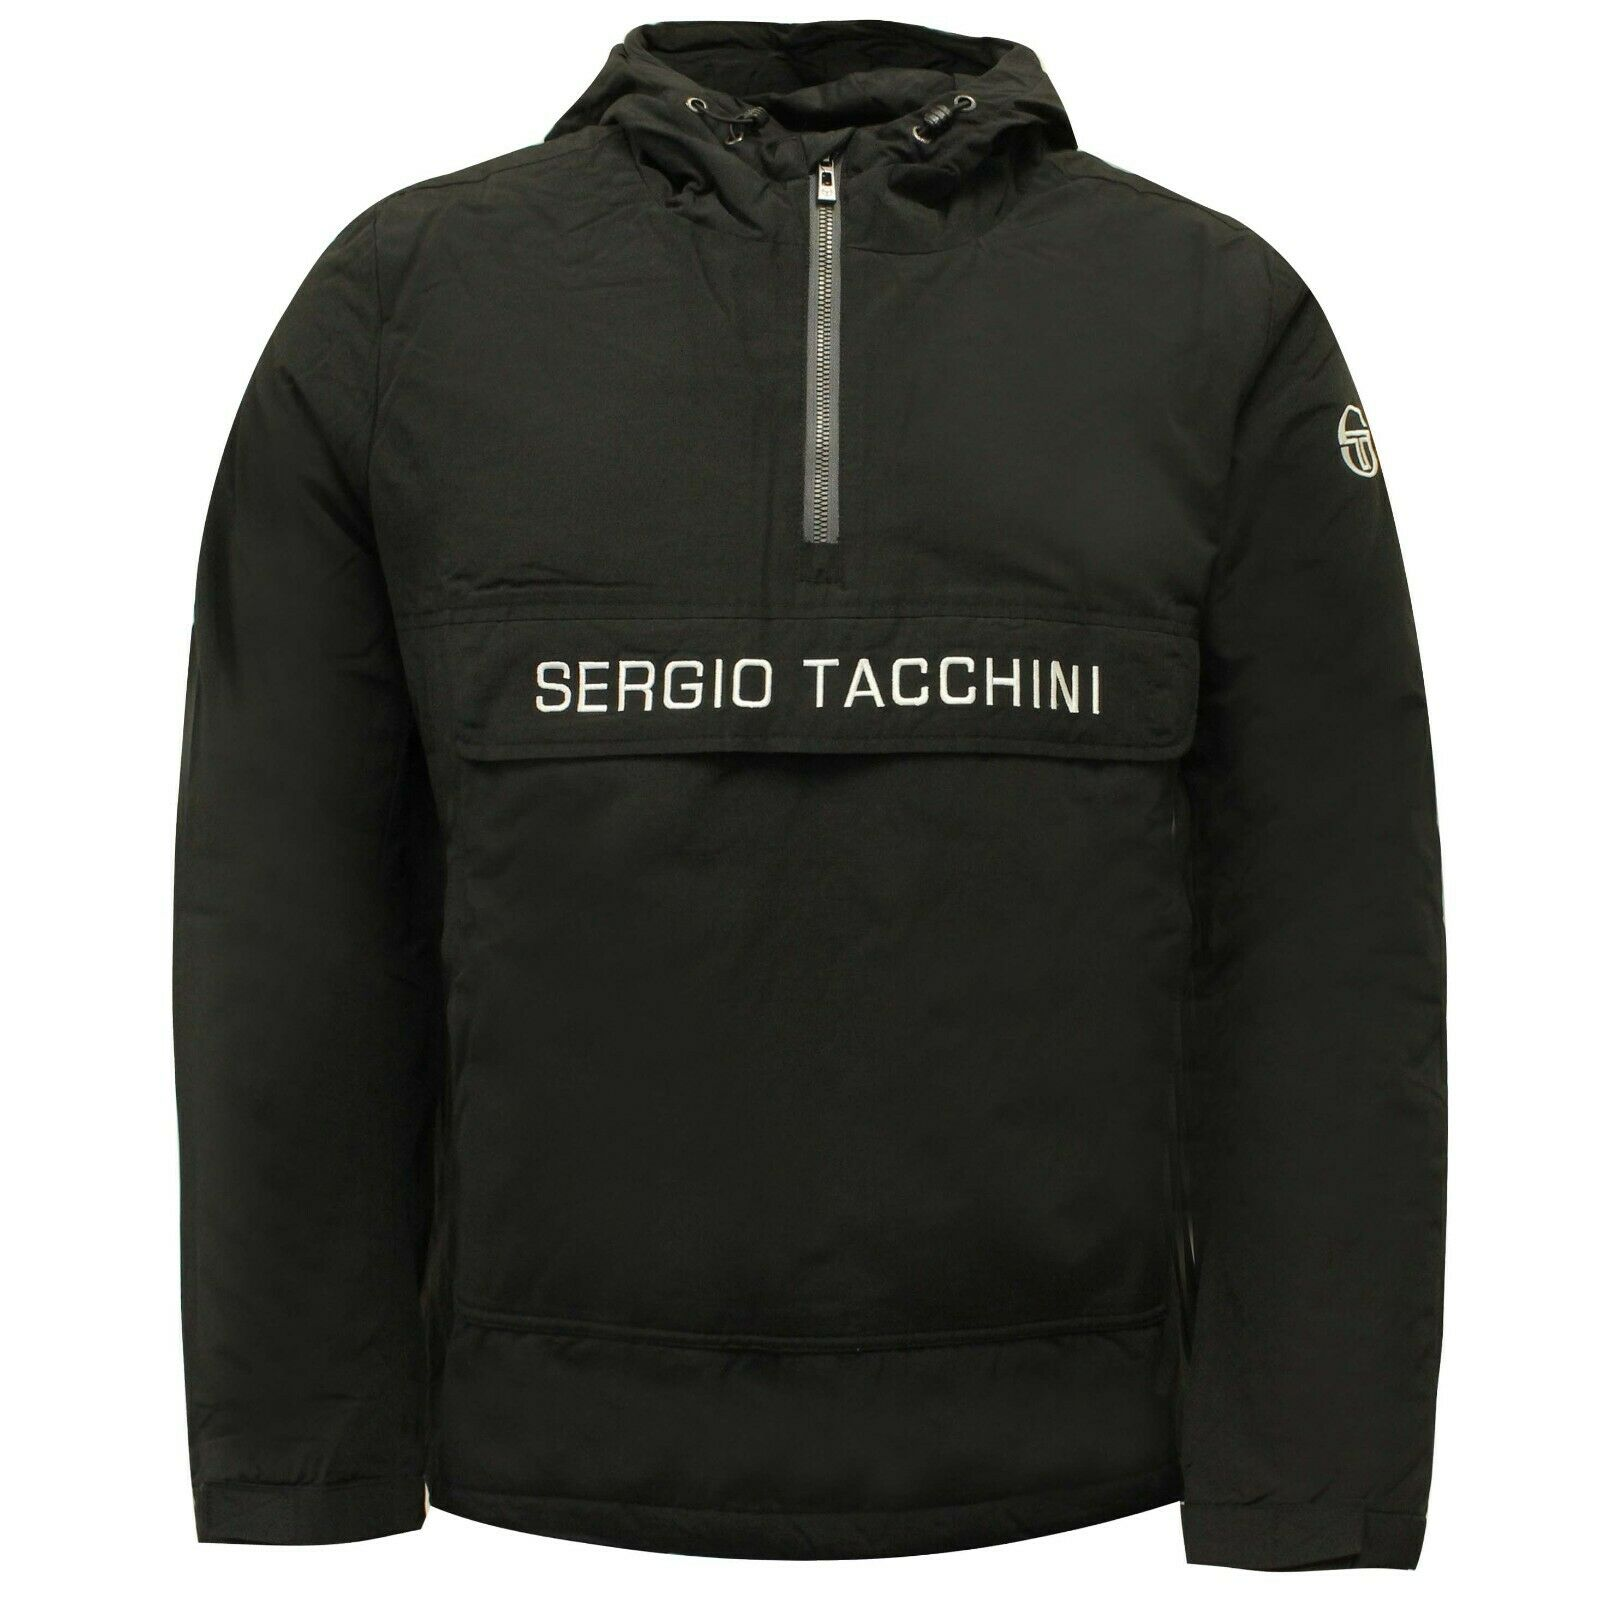 Bnwt-Sergio Tacchini T-Shirt Bleu marine-petit